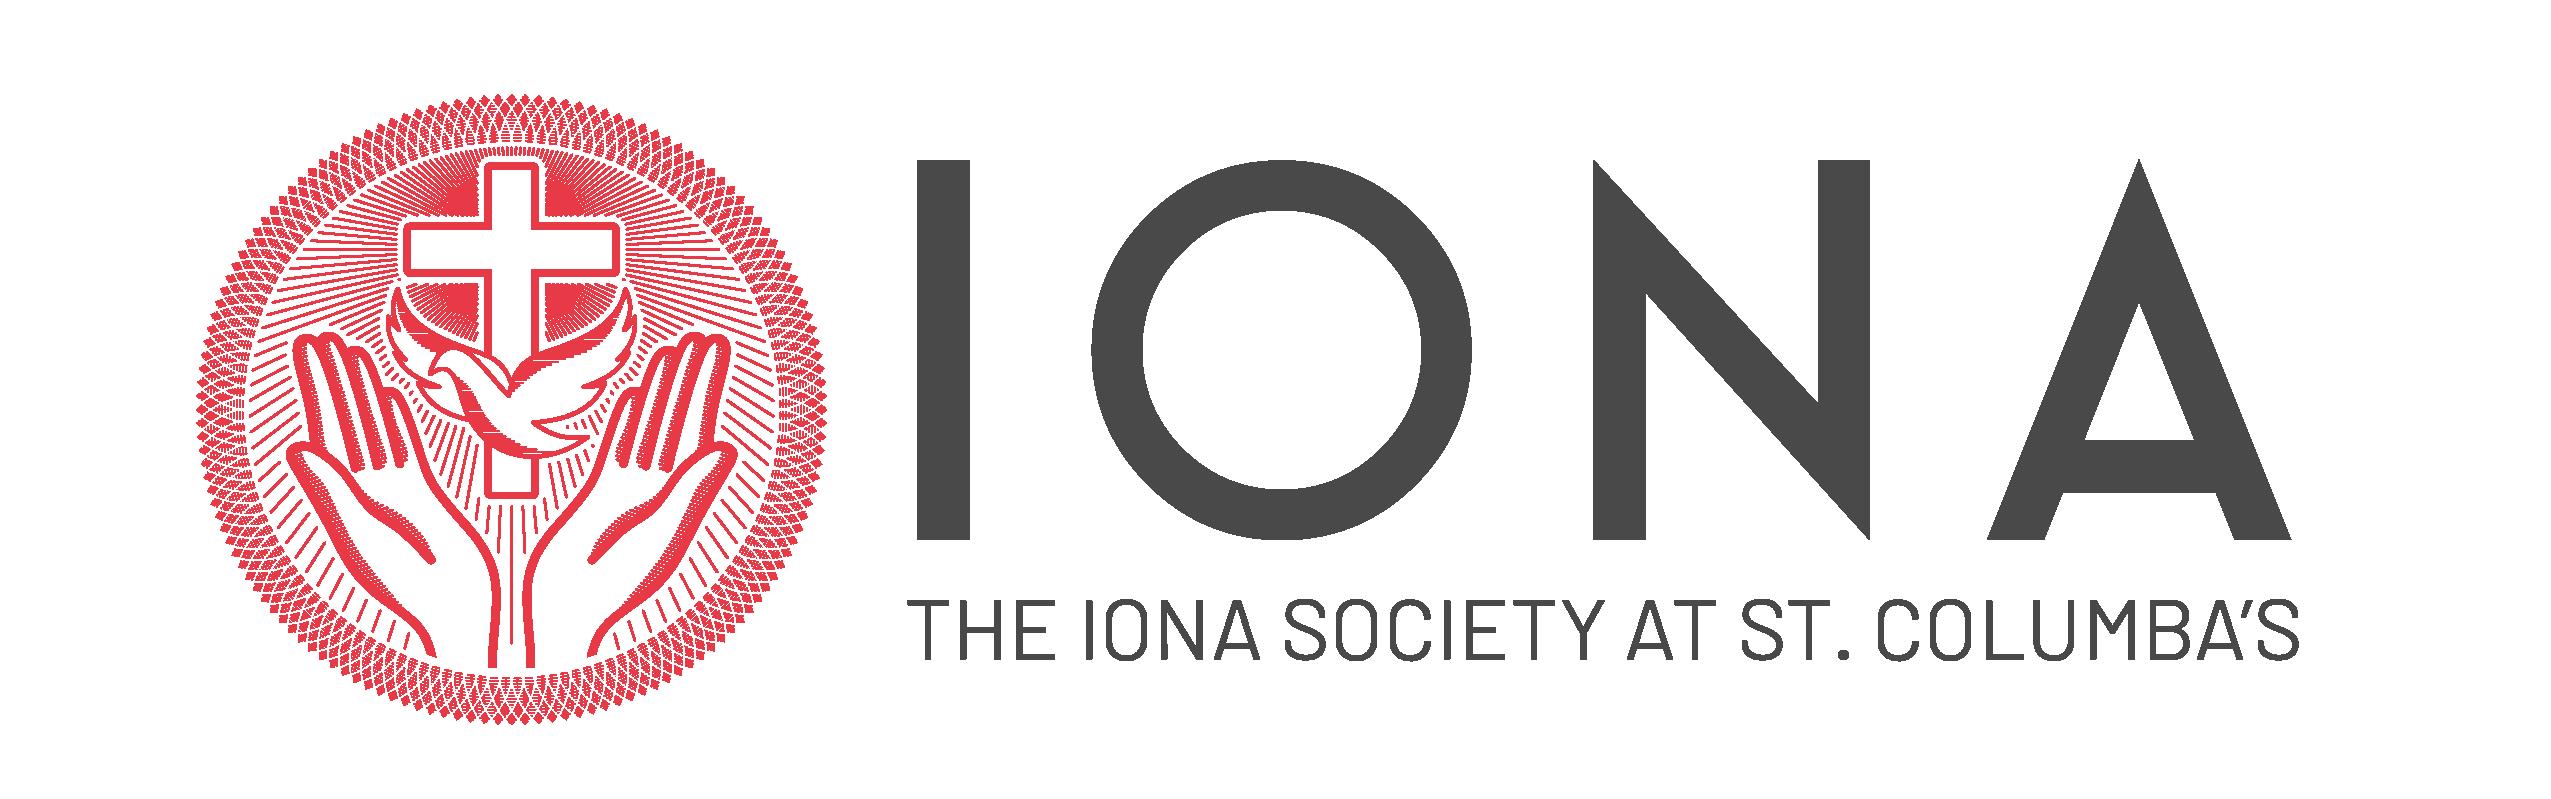 iona-01_41